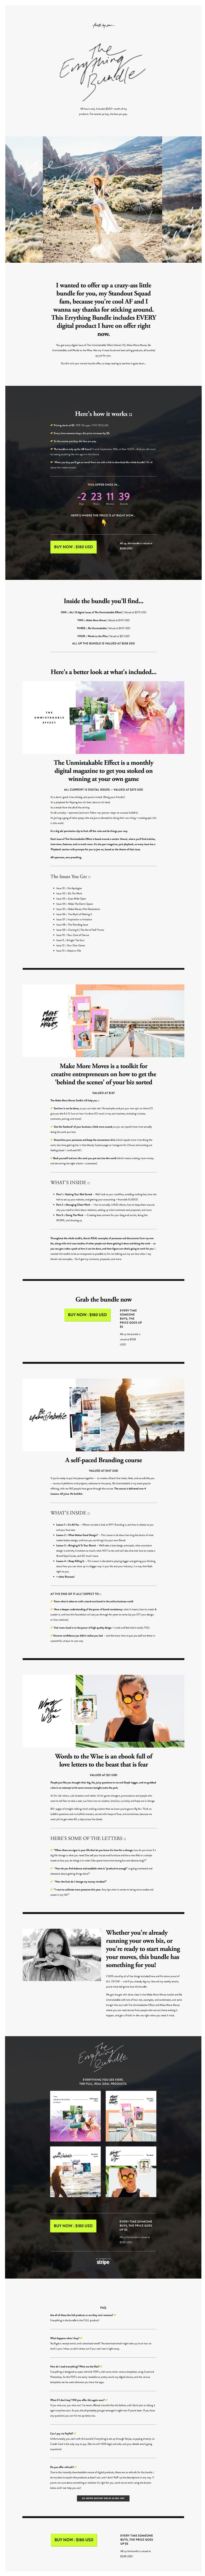 Errything-Sales-Page.jpg